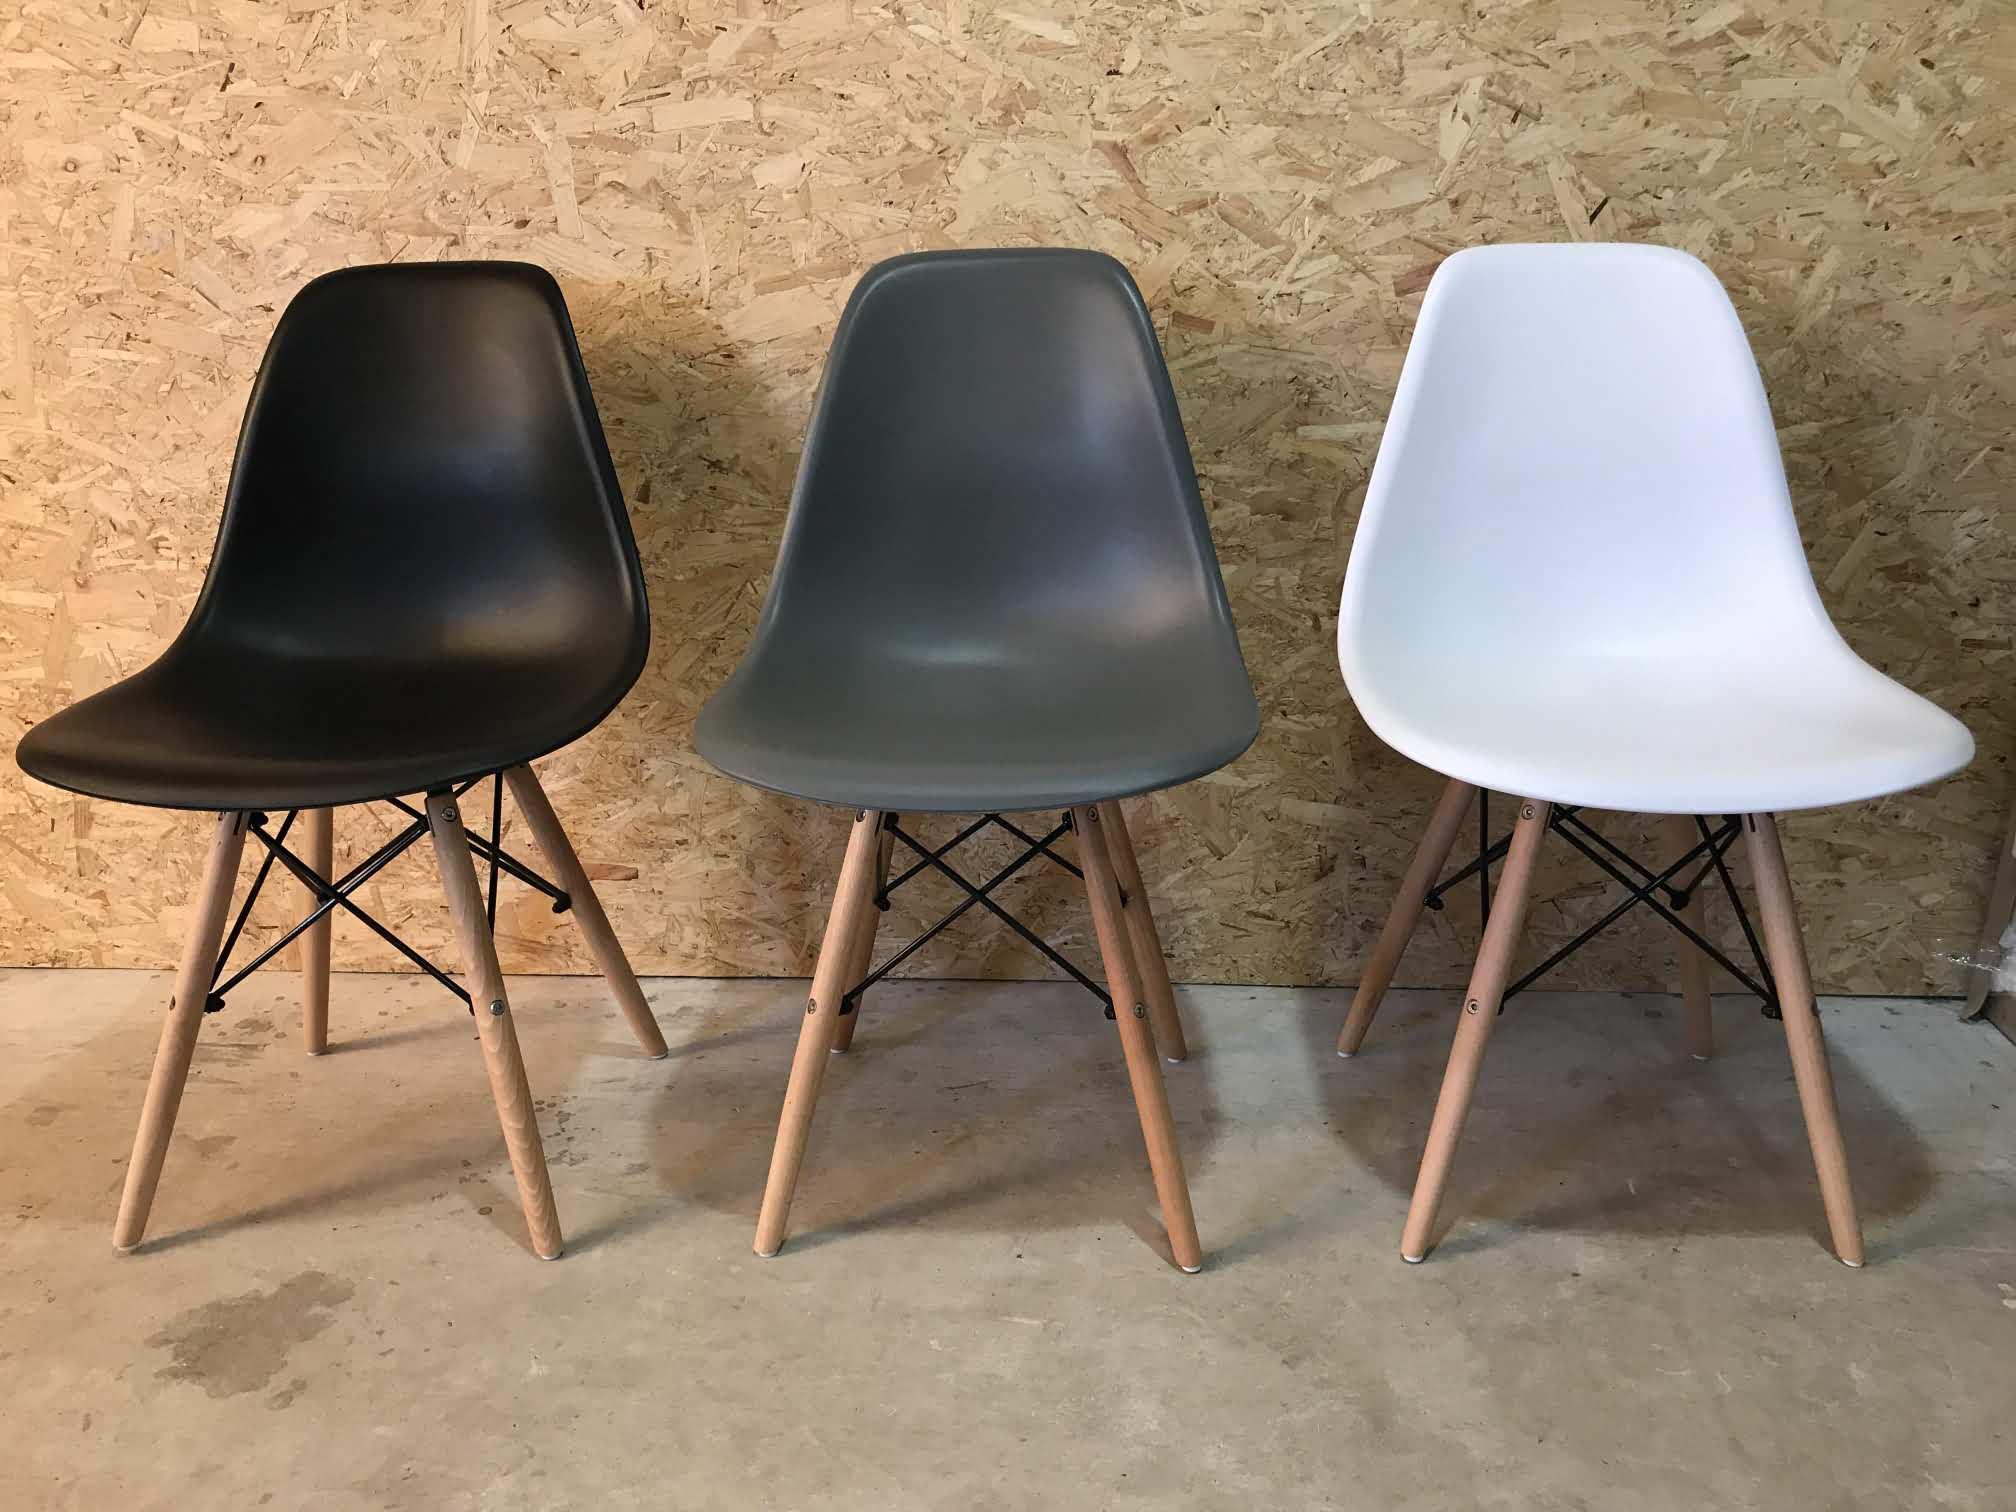 Eames Replica Stoel : Afrit 29 starterscollectie sergei zwart grijs wit replica eames dsw